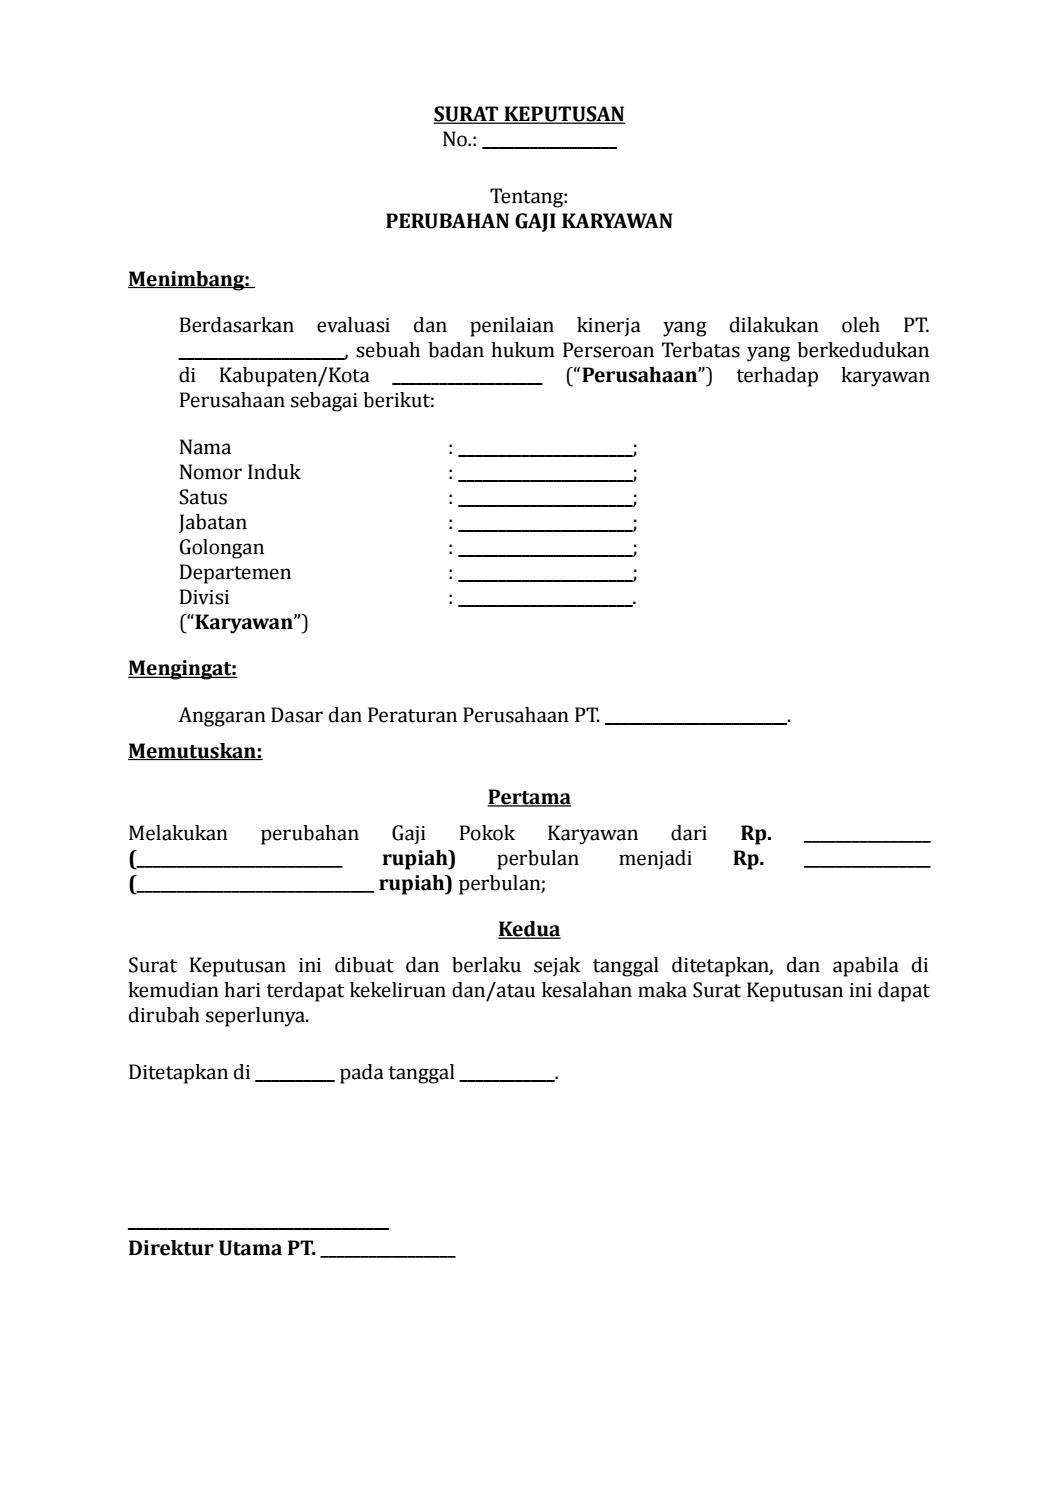 06 Draf Surat Keputusan Perubahan Gaji Karyawan By Arif